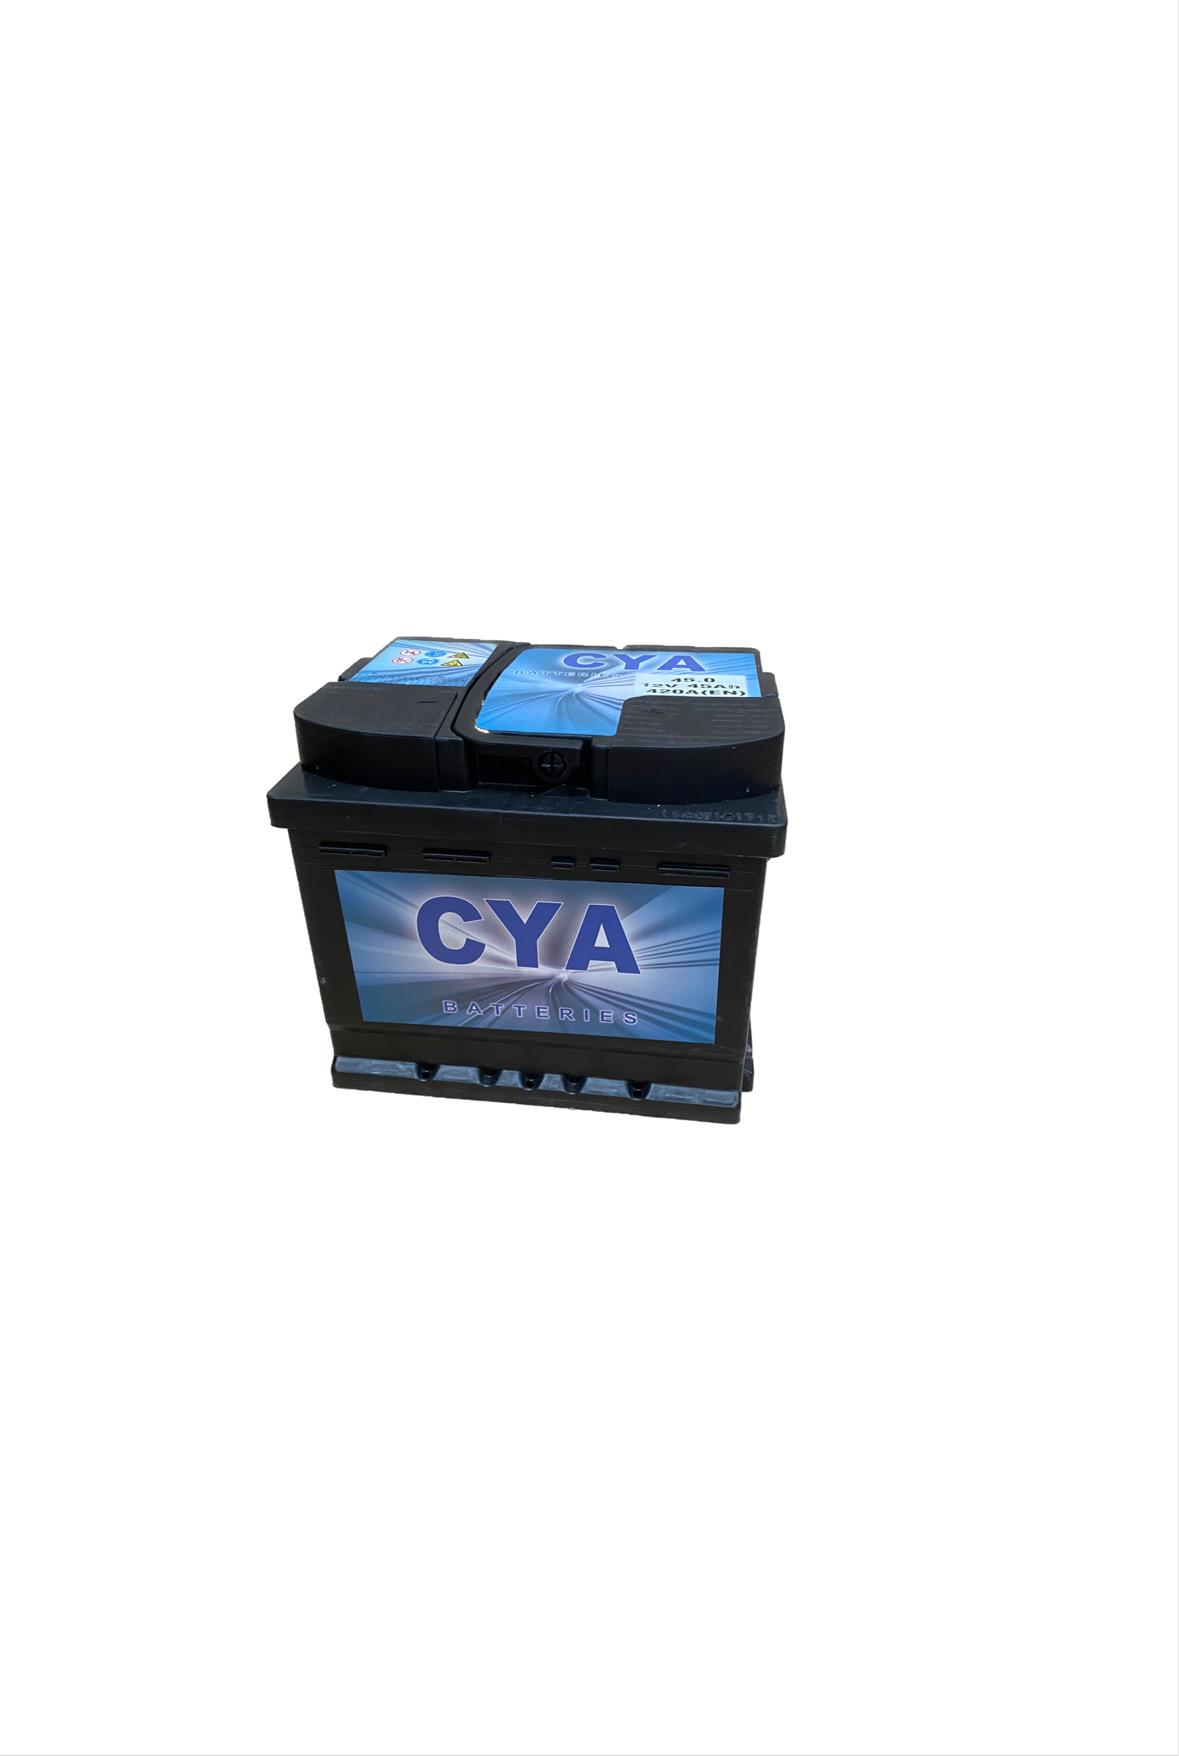 Bateria CYA 35 Ah. Japonesa